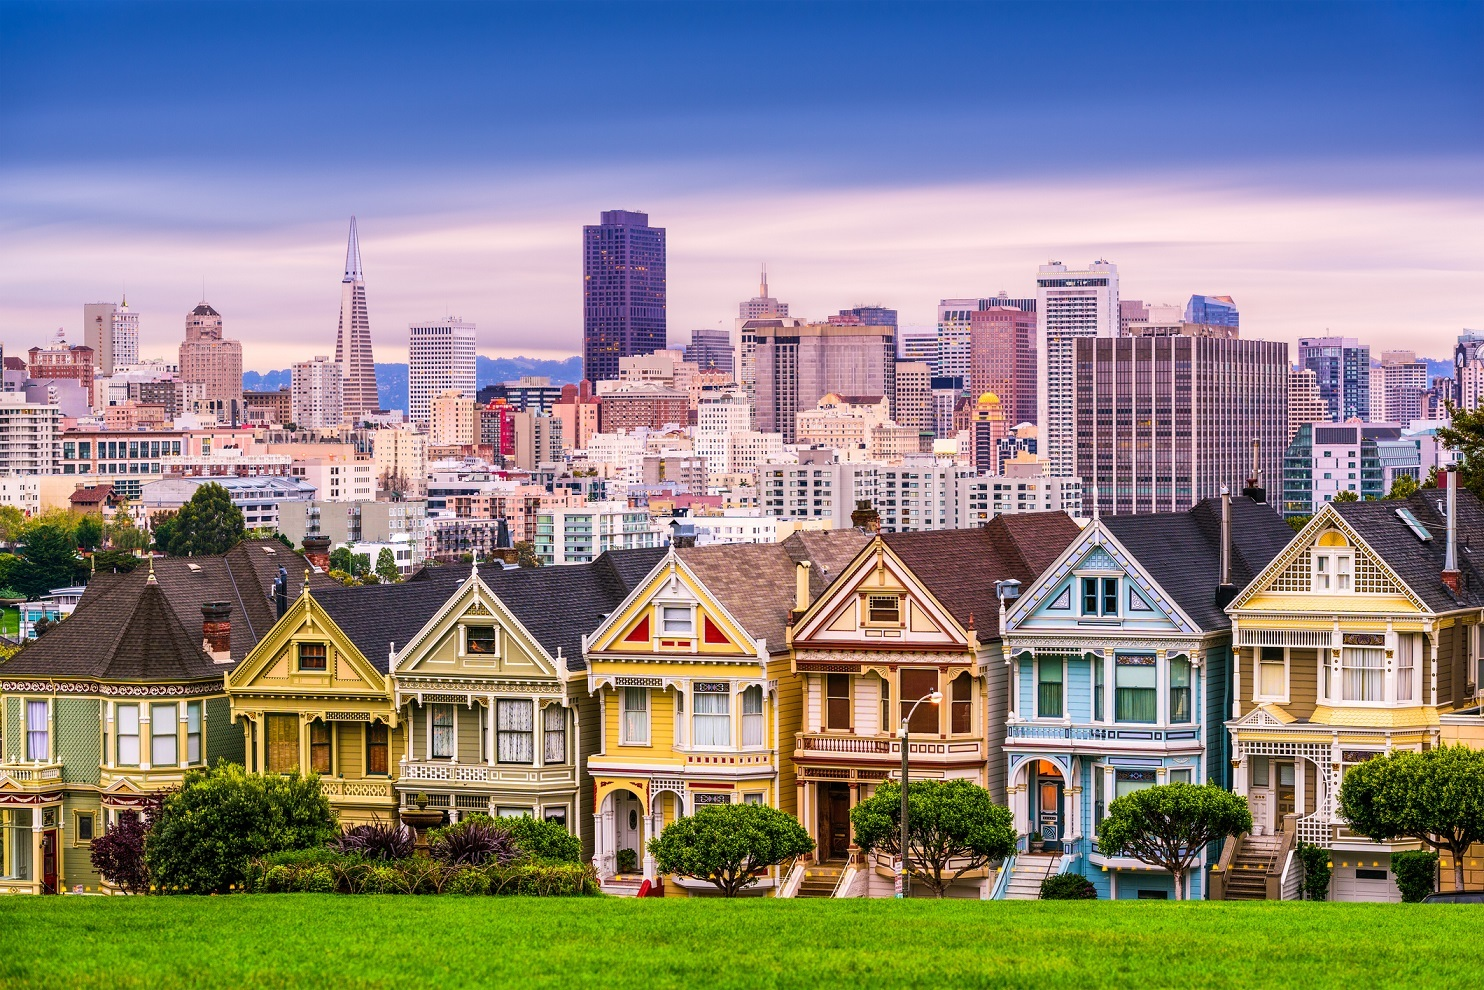 San Francisco Skyline with painted ladies